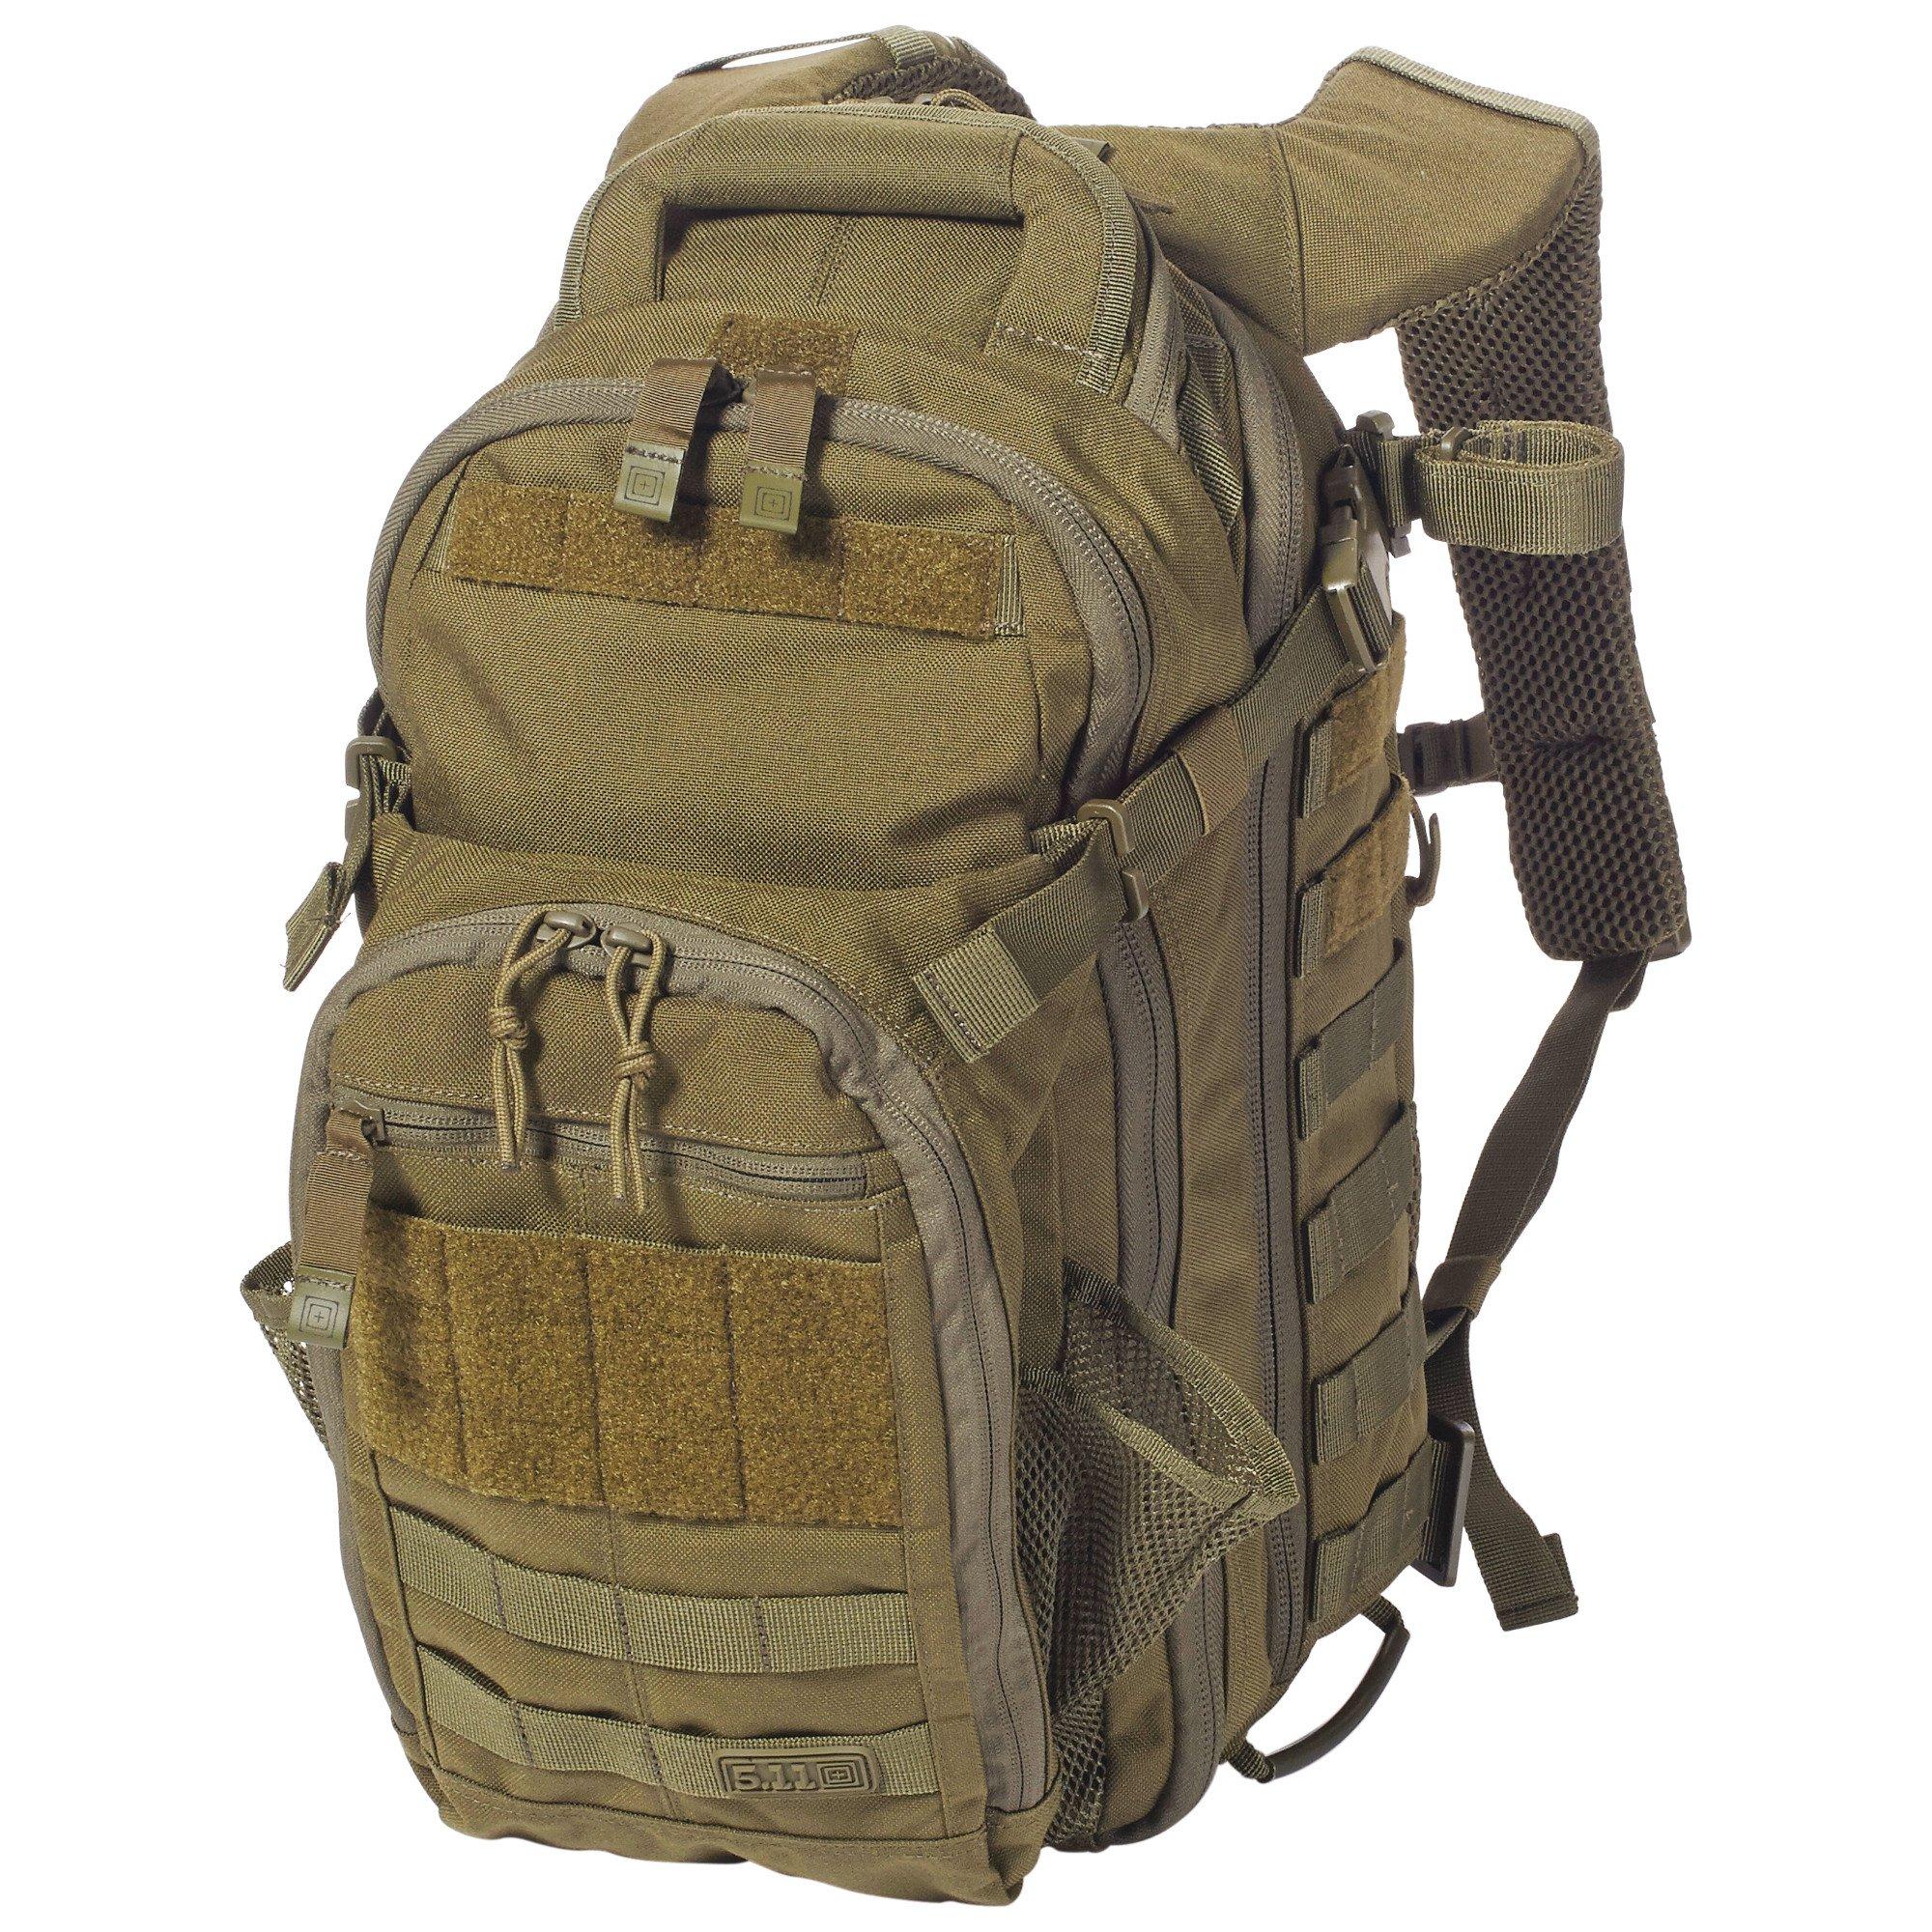 Balo 5.11 Tactical ALL HAZARDS NITRO 21L – Tac OD